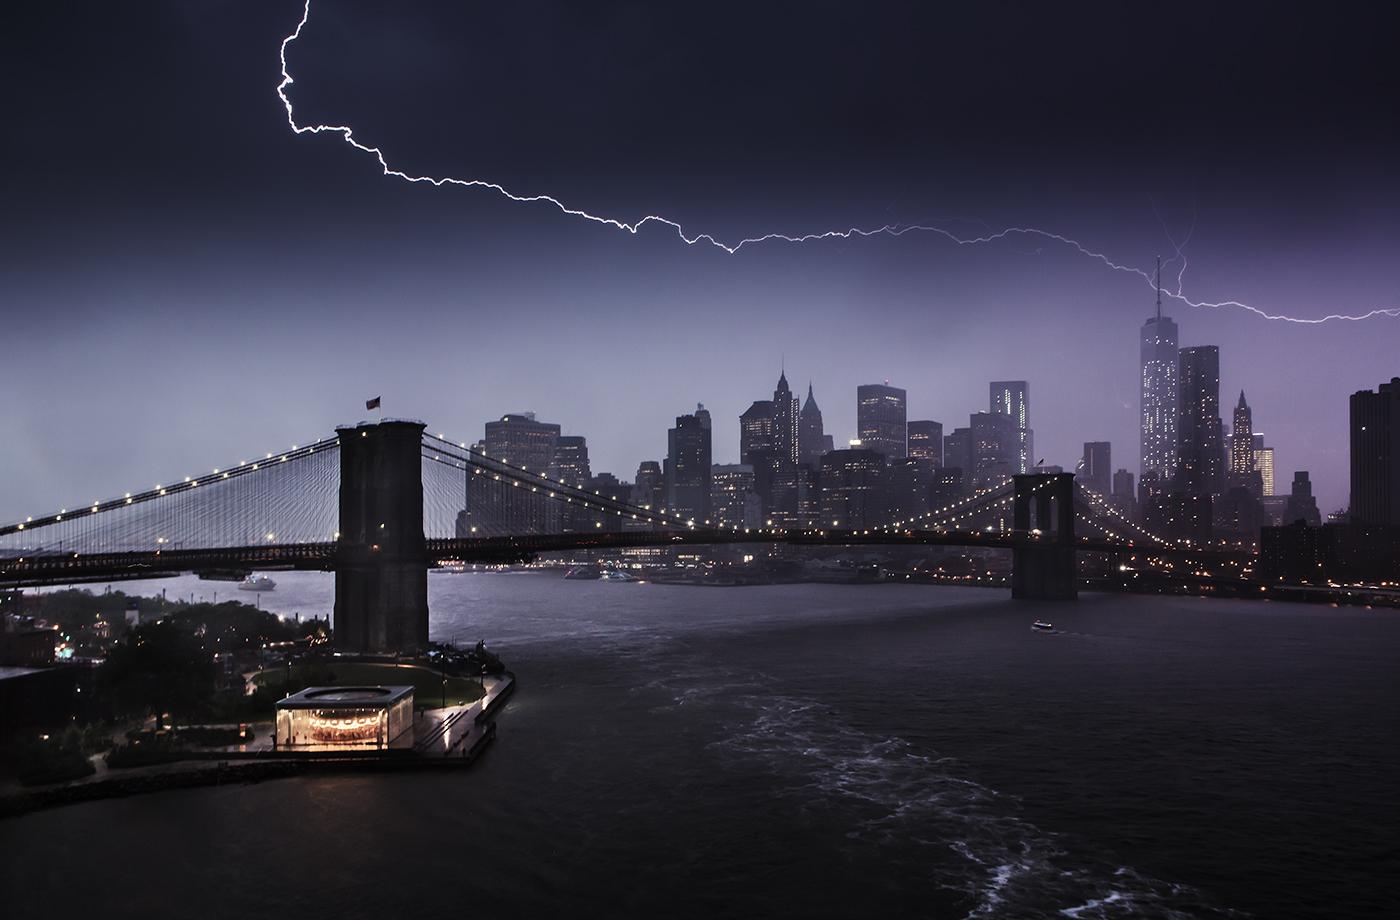 Lightning over Manhattan  Edward Reese Photography